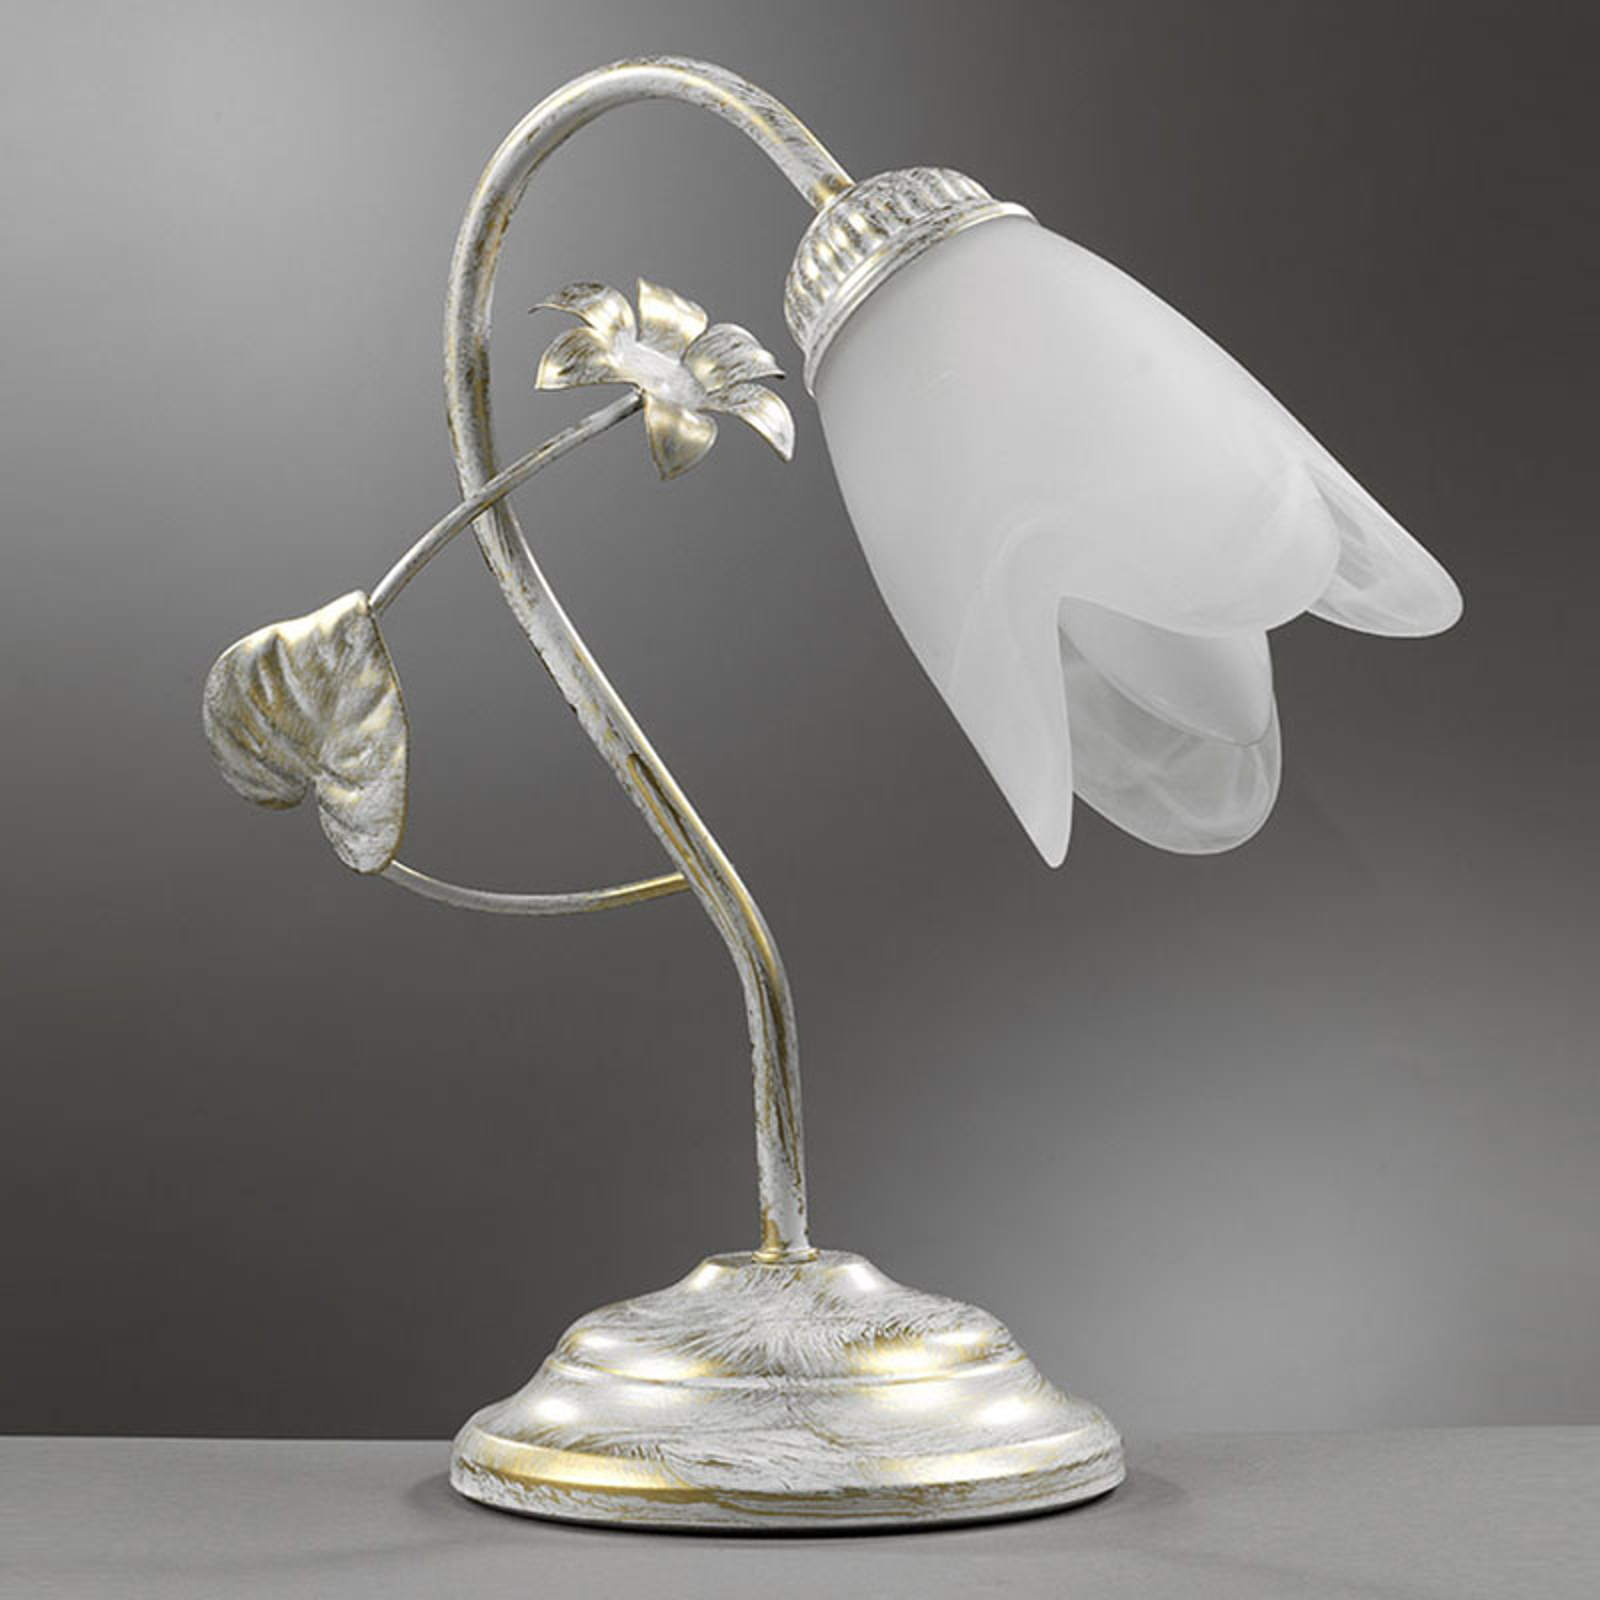 Petunia bordlampe, florentinsk, 1 lyskilde